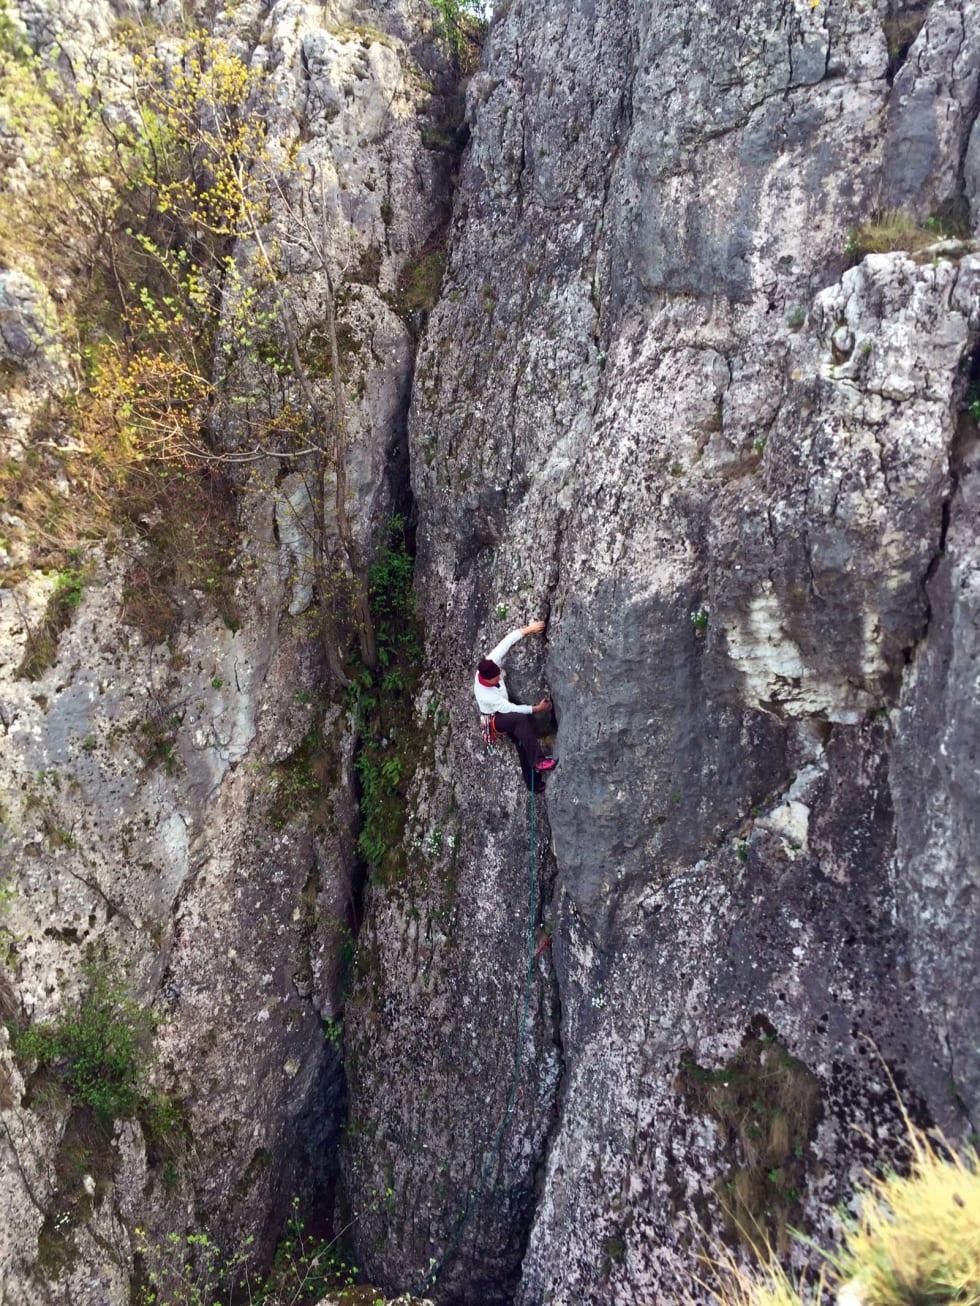 Fra toppen: Jeg titter over kanten på et tårn, og der er Lars Borg i gang med sin rute nummer 37. Foto: Dag Hagen